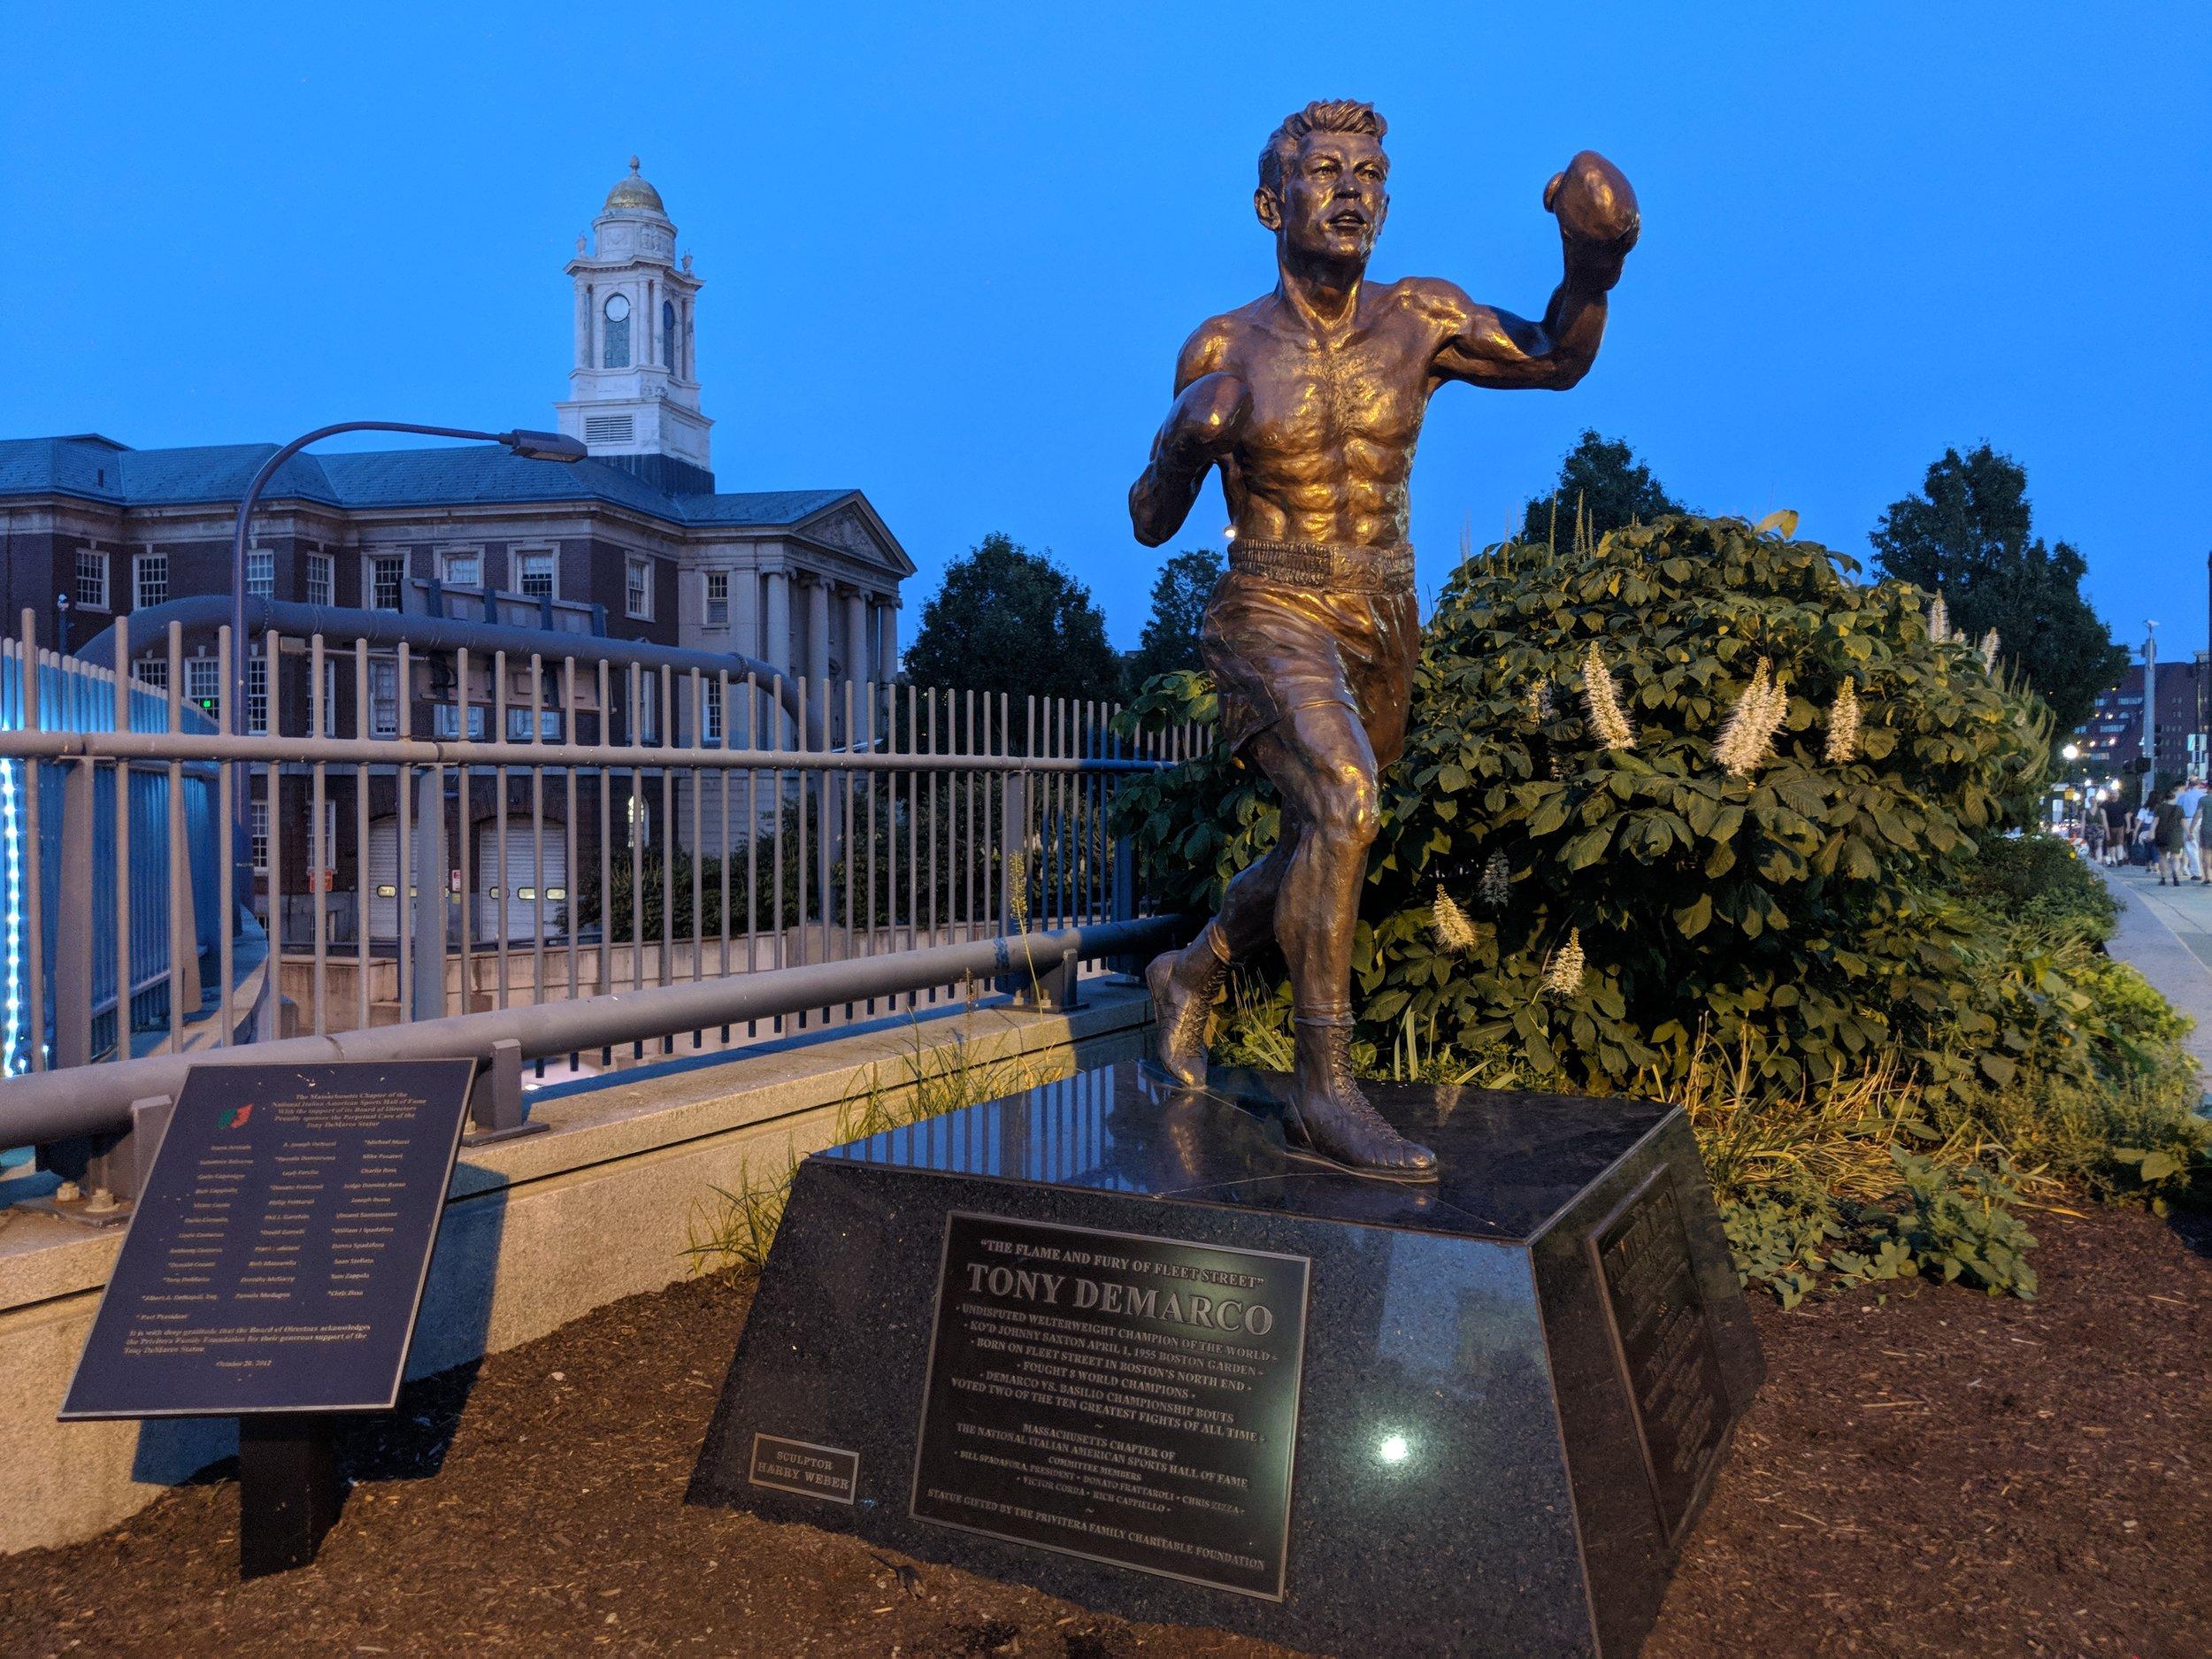 Tony DeMarco Boxer Statue - 191 Hanover Street, Boston, MA 02113 - Tour Start Point